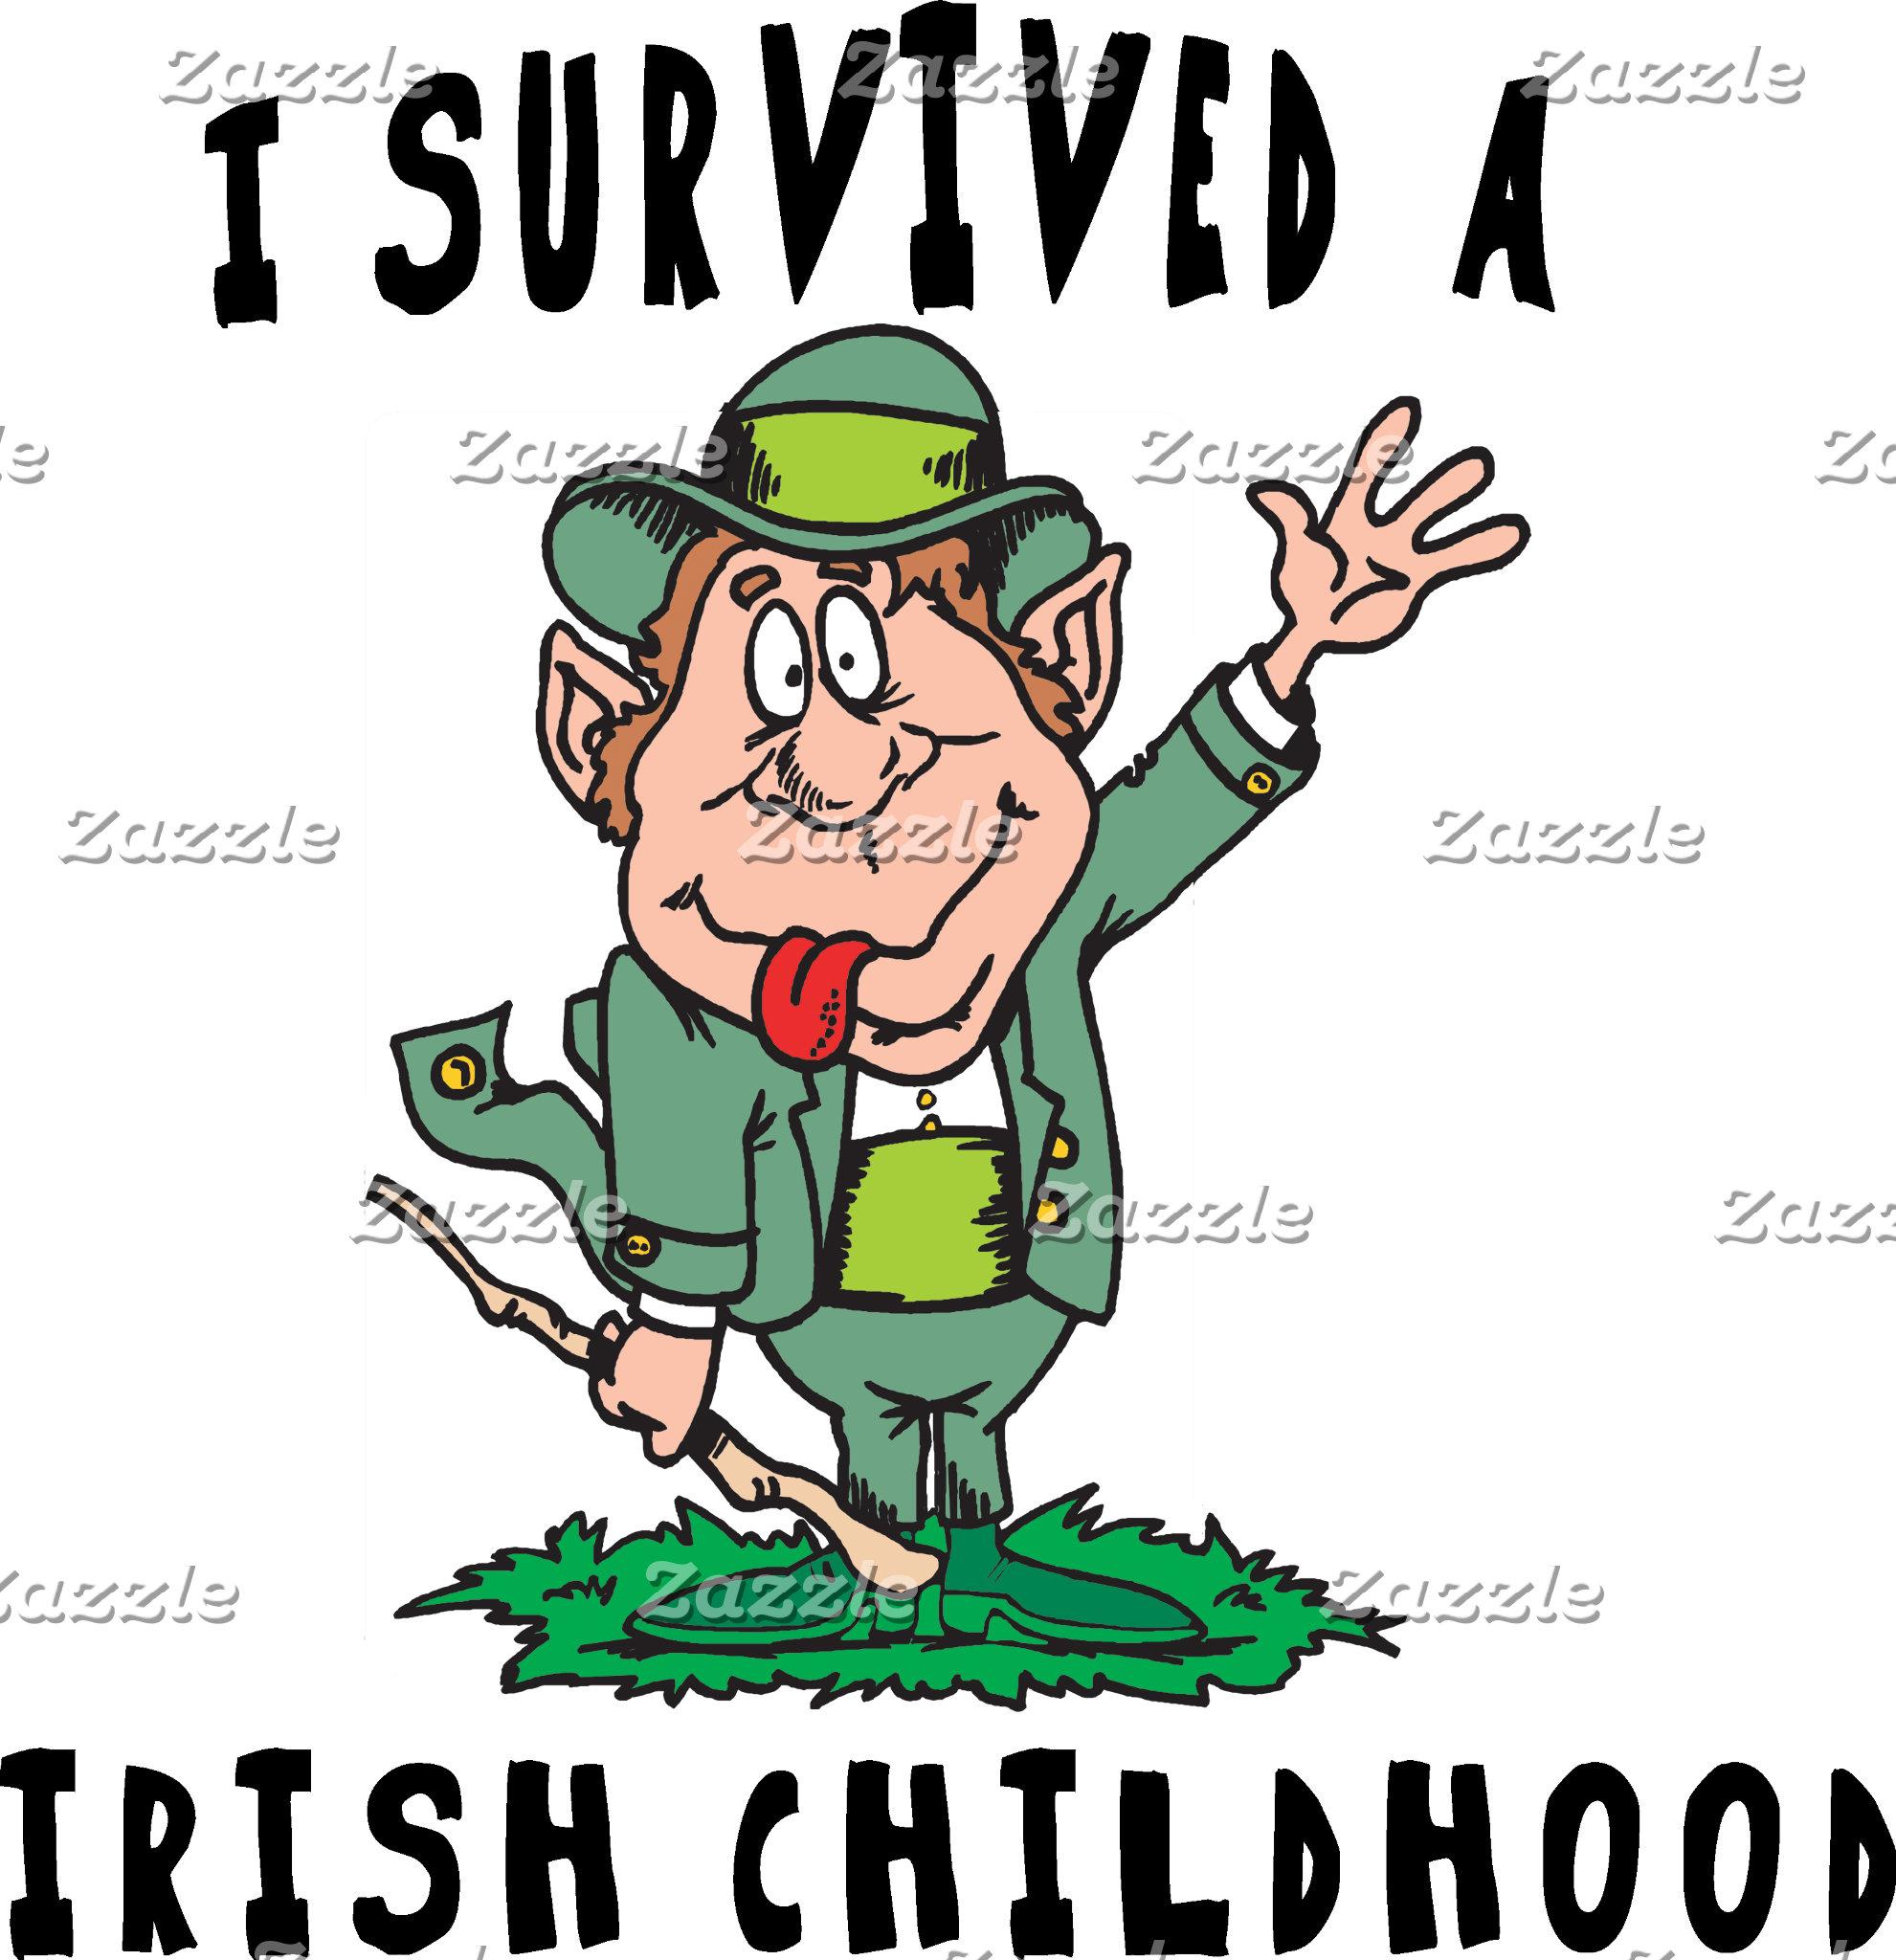 Funny Irish - I Survived A Irish Childhood T-Shirt